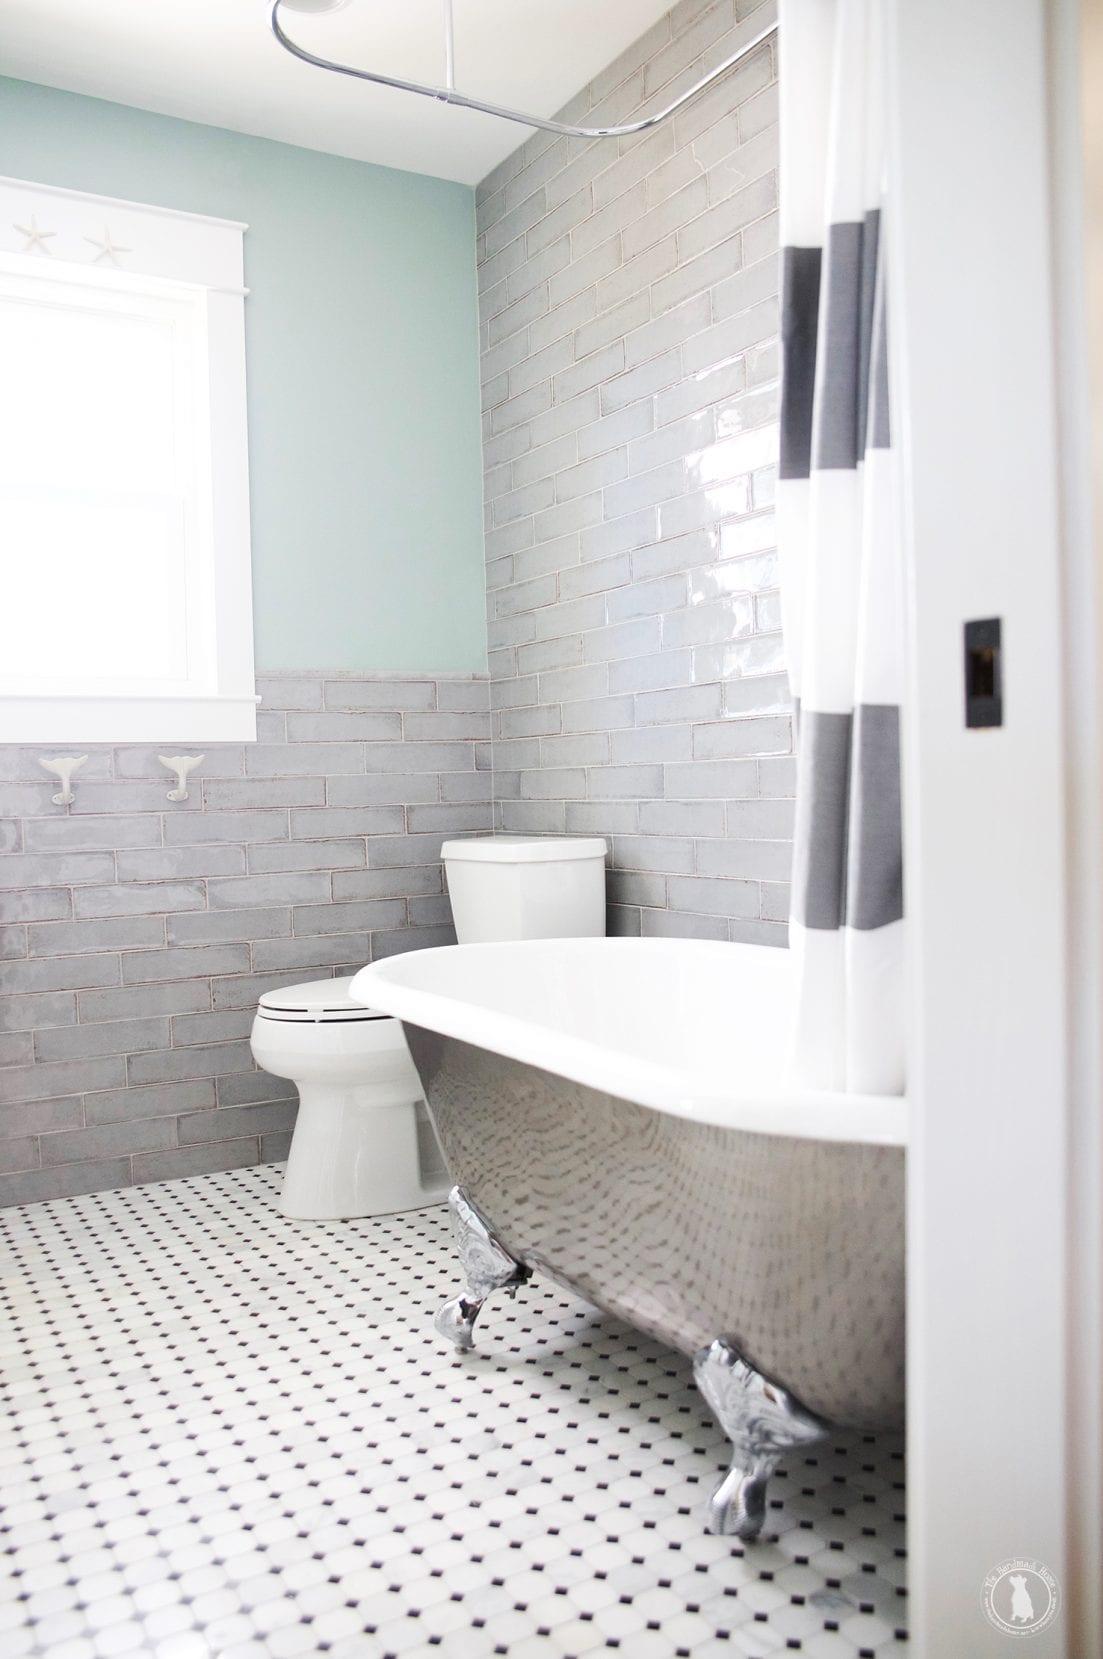 Designing a Small Bathroom - Helpful Tips & Tricks For A Small Bathroom.